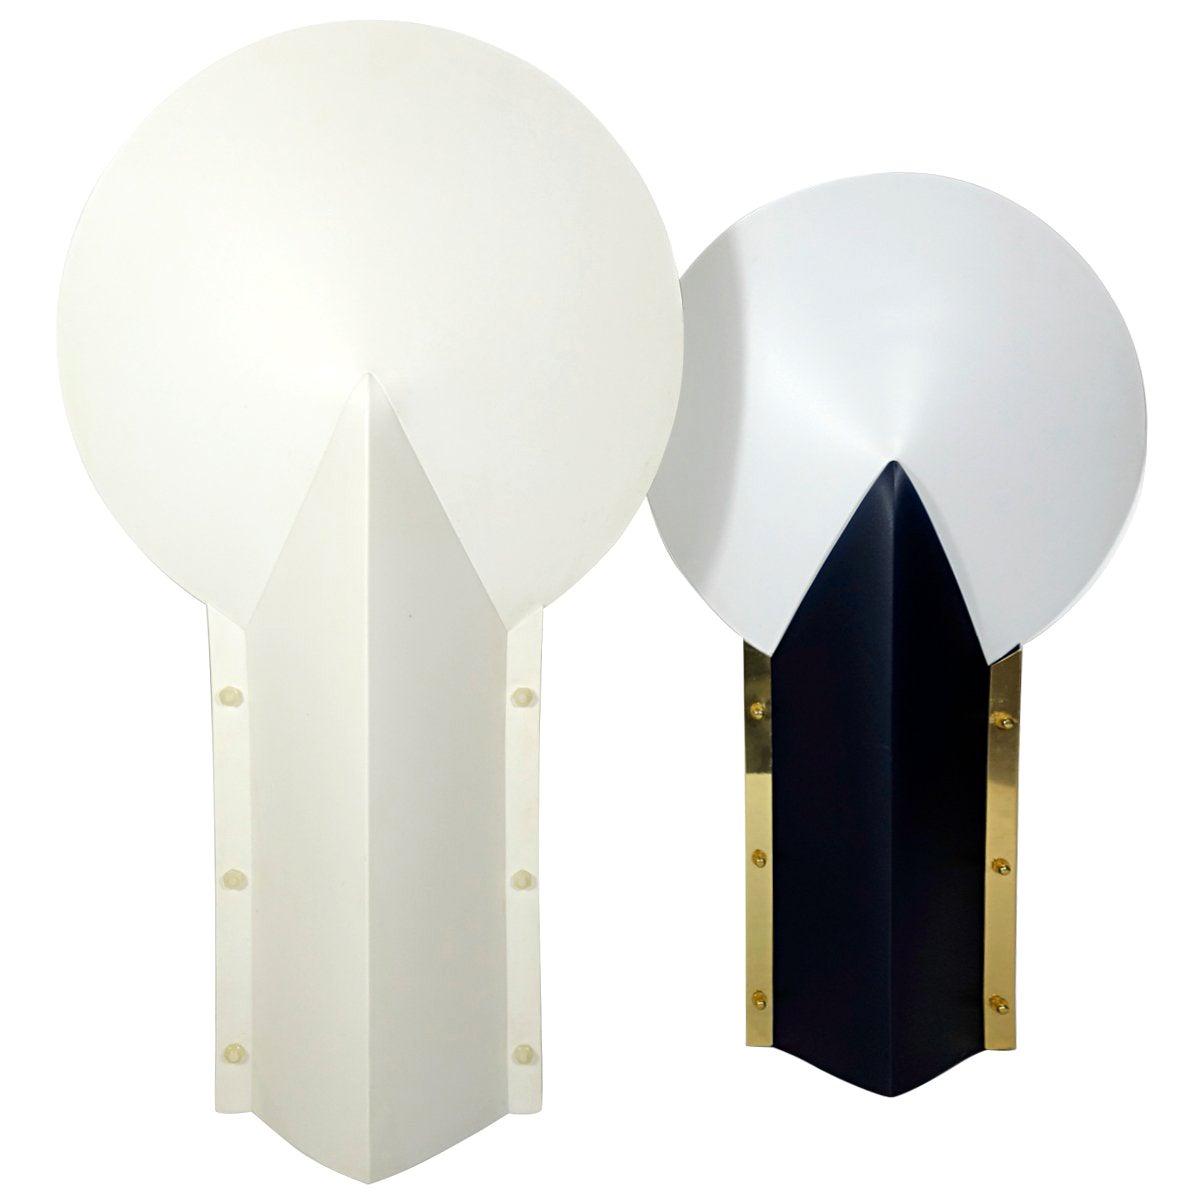 Postmodern Reflex or Moon Lamps by Samuel Parker for Slamp